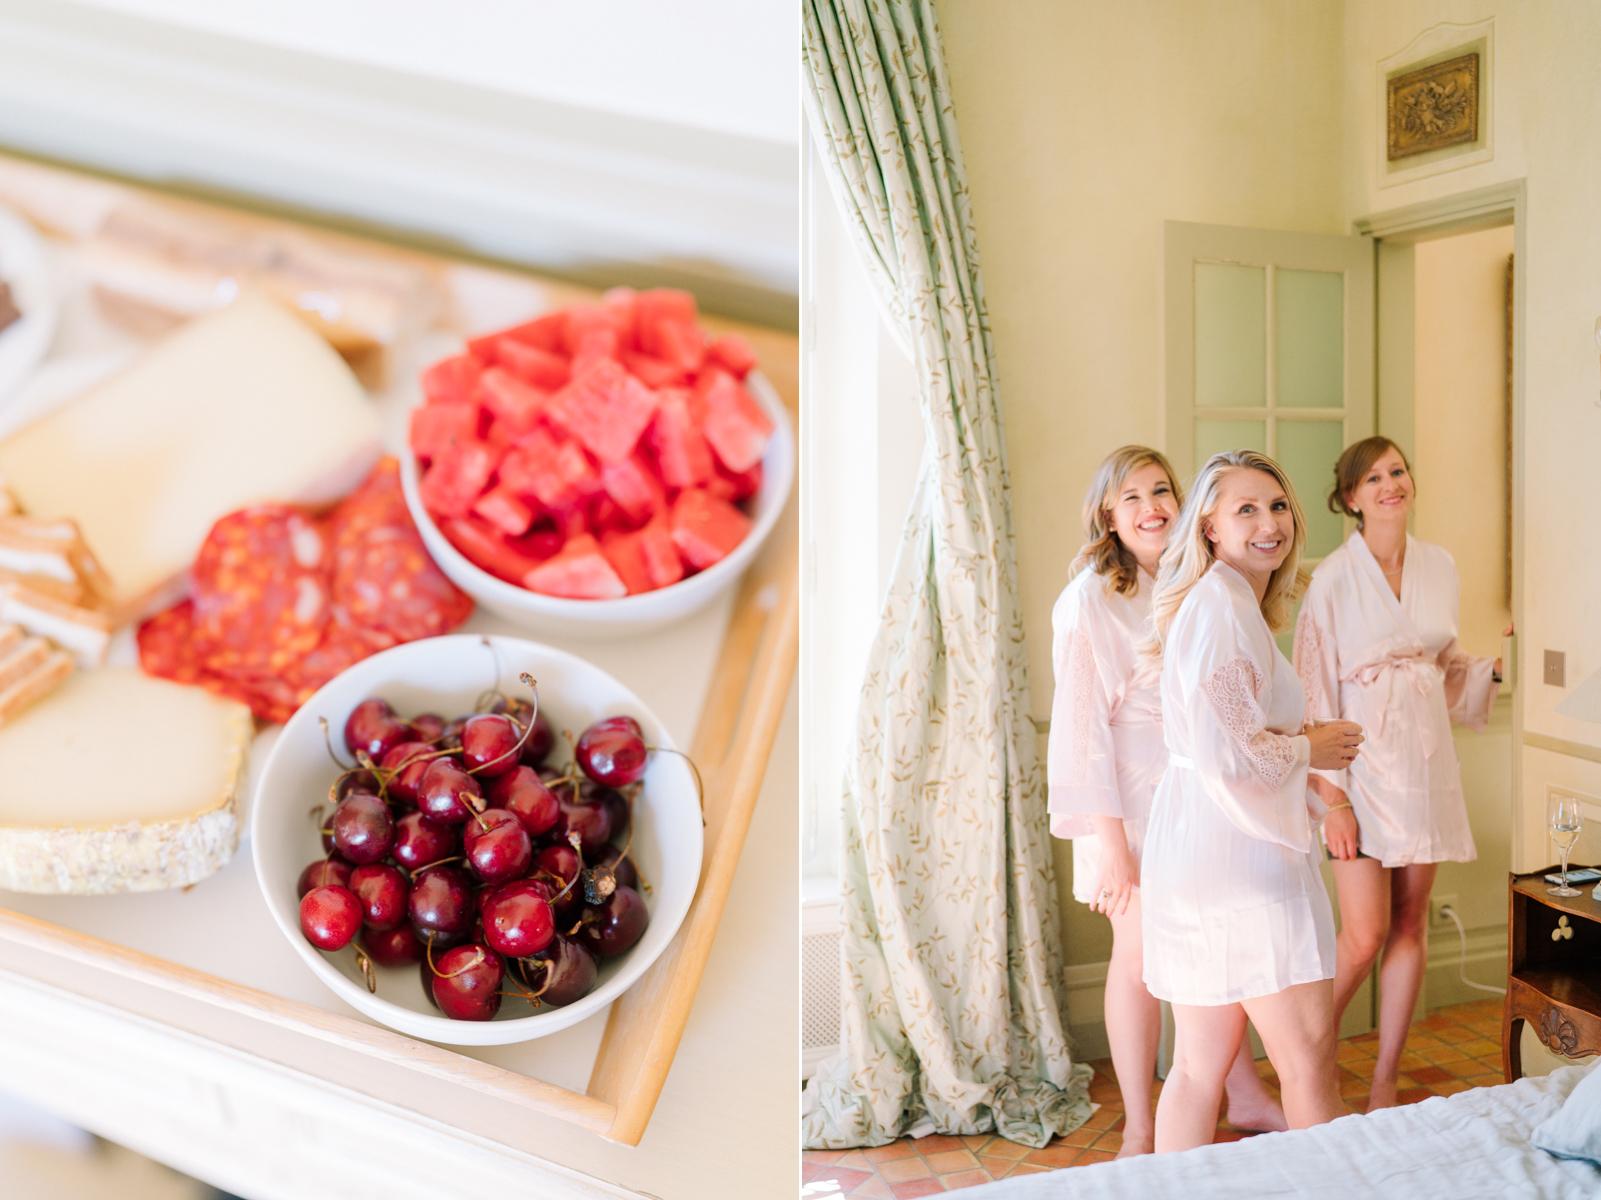 Boheme-Moon-Photography-Wedding-in-Provence-France_013.jpg